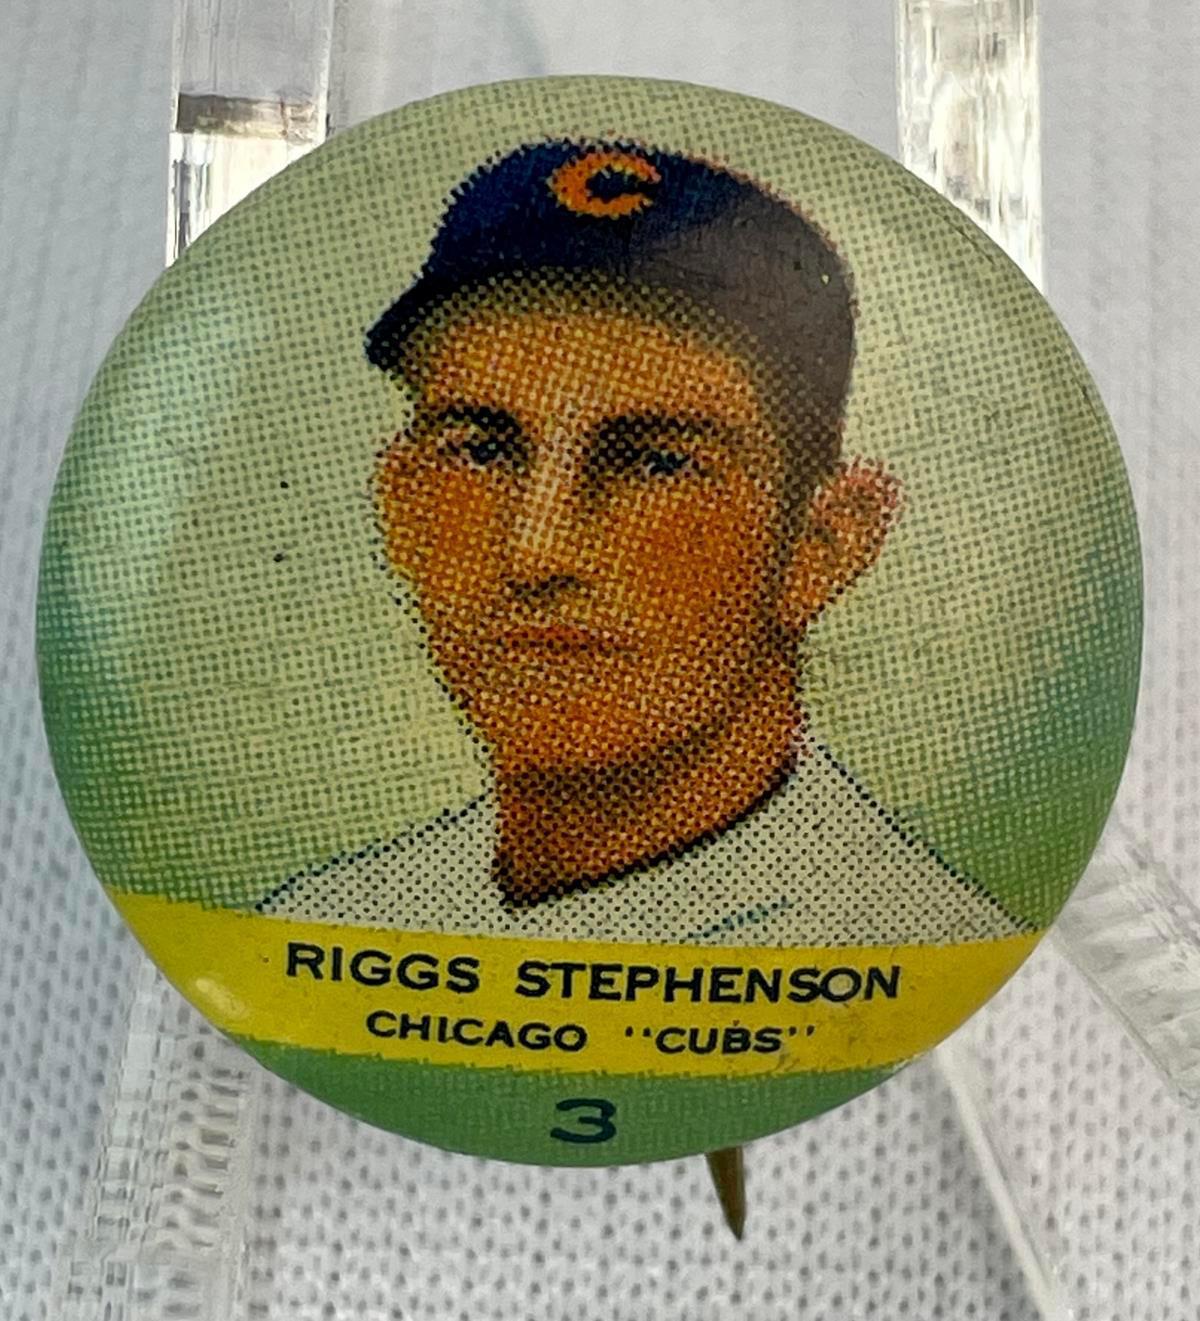 Vintage 1932 No. 3 Riggs Stephenson Chicago Cubs Orbit Gum Baseball Pinback